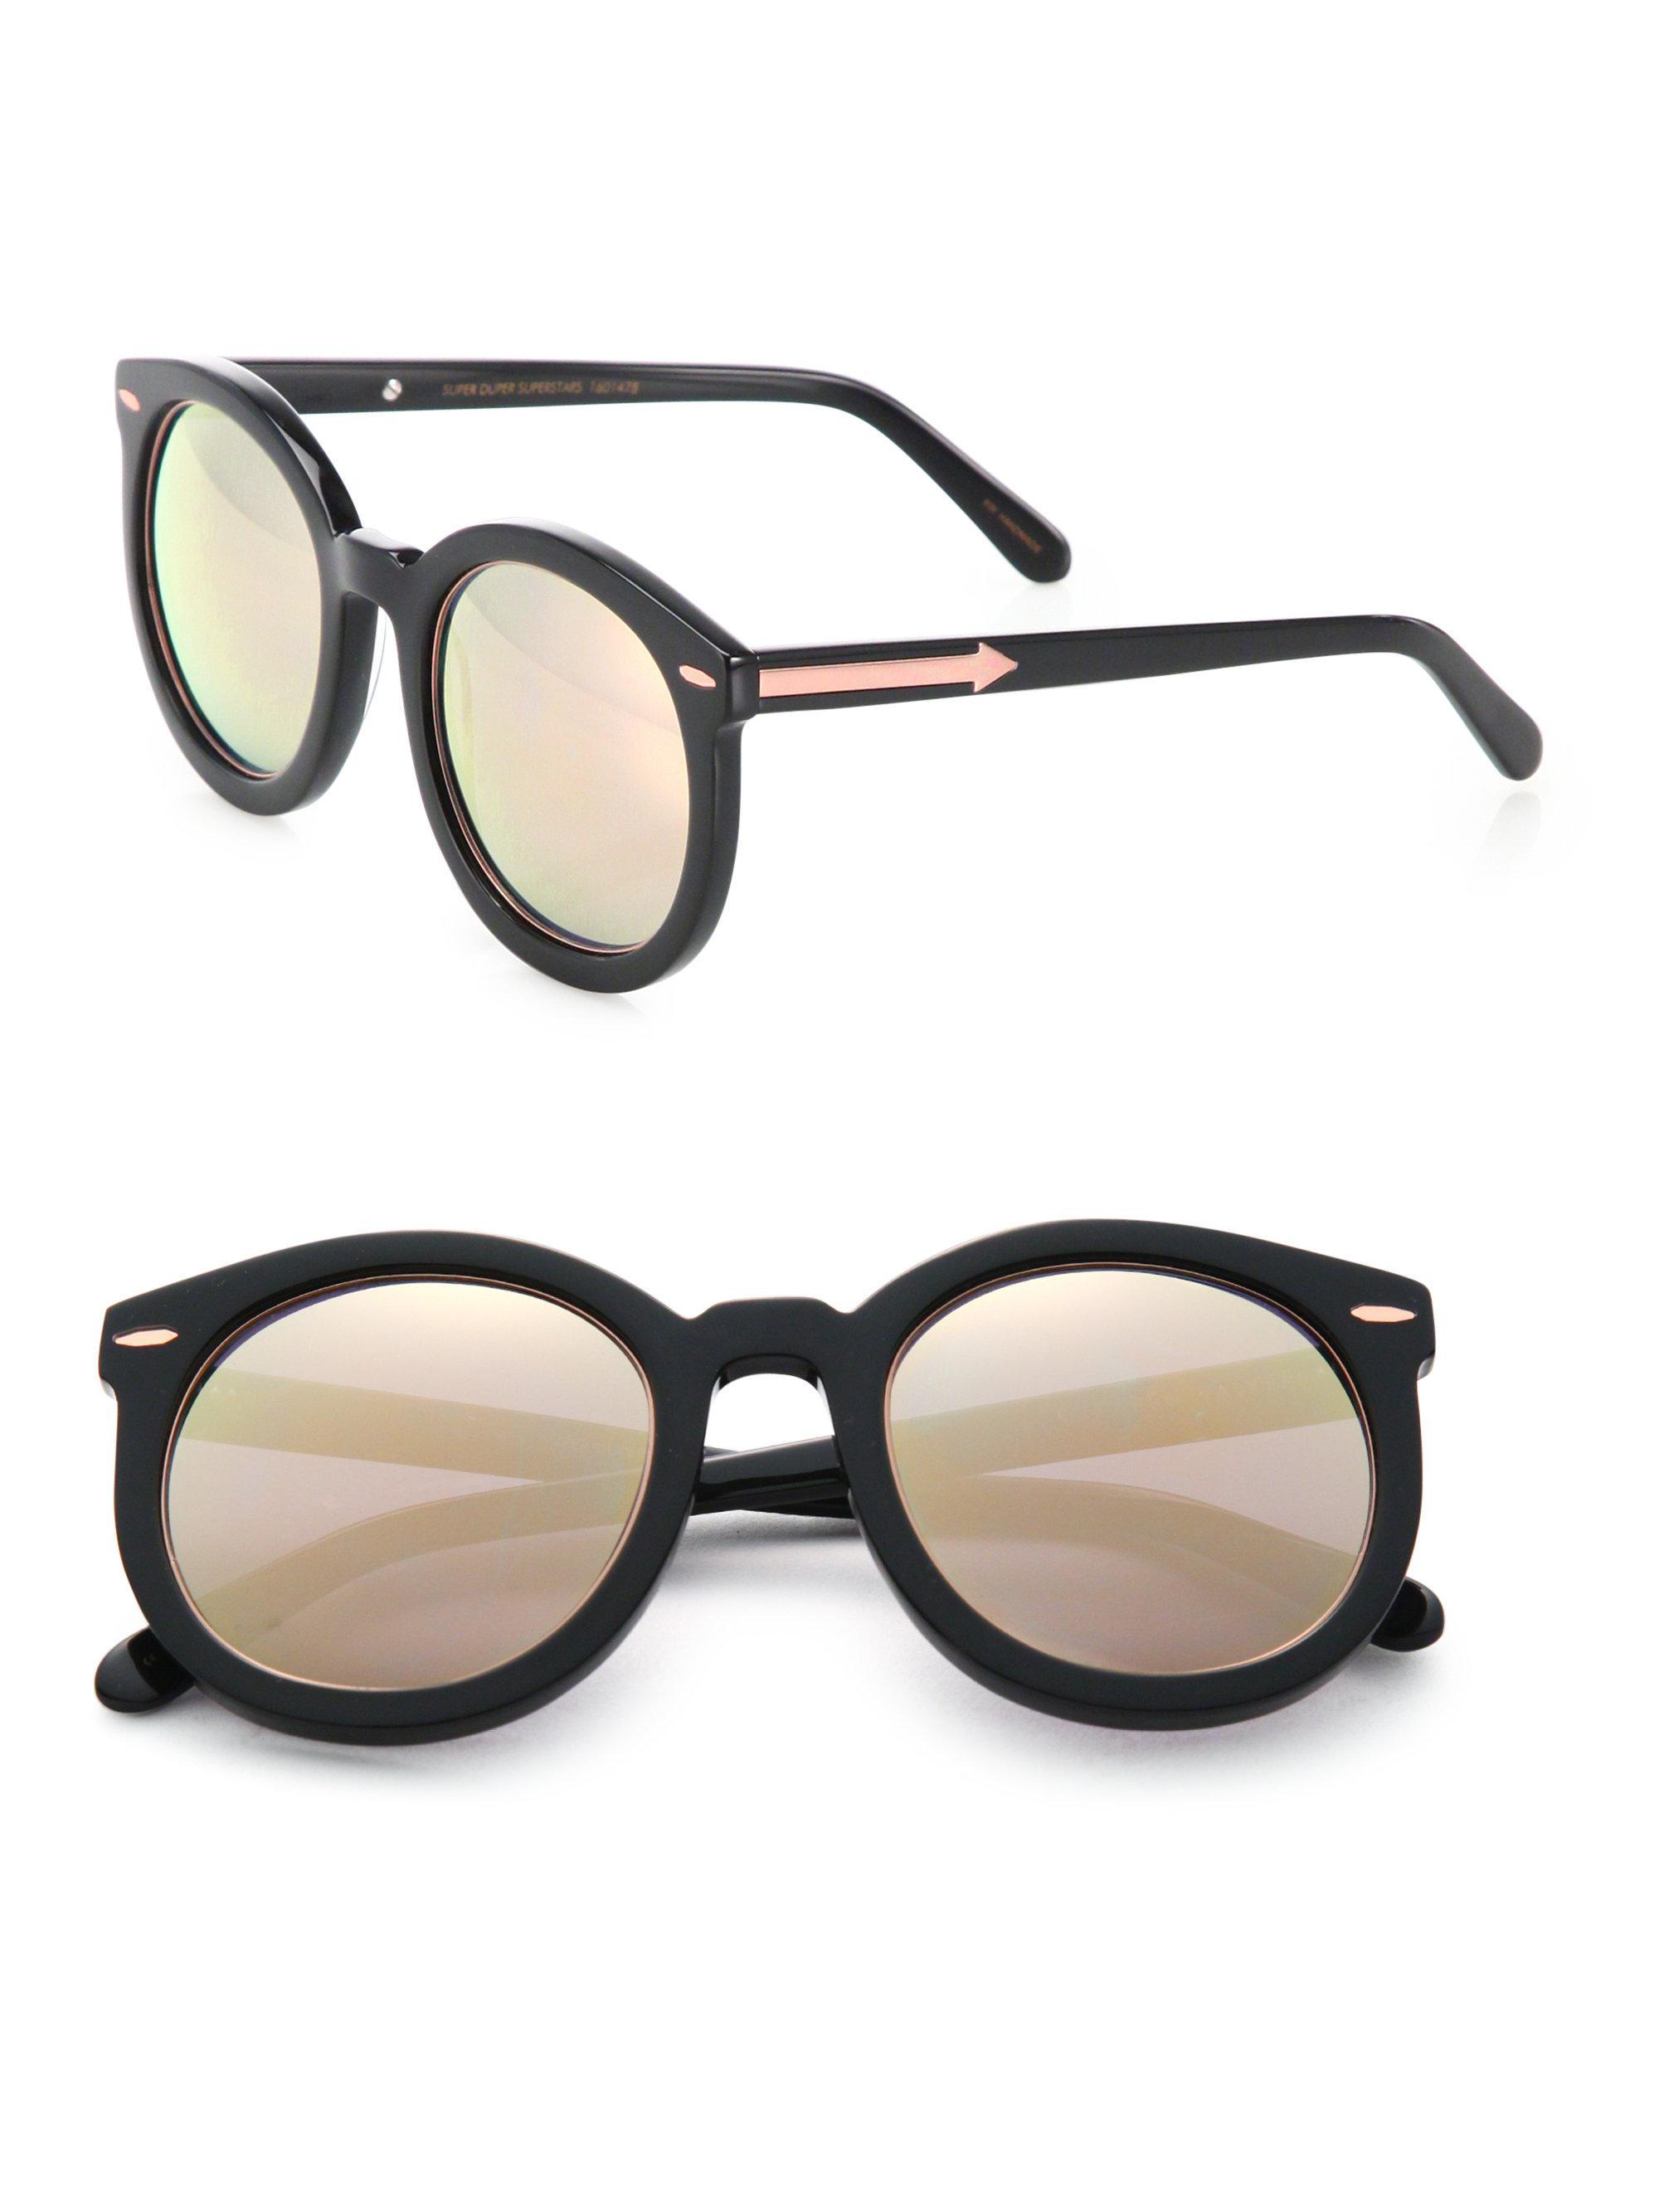 41945bcf143 Lyst - Karen Walker Super Duper Superstars 53mm Round Sunglasses in ...